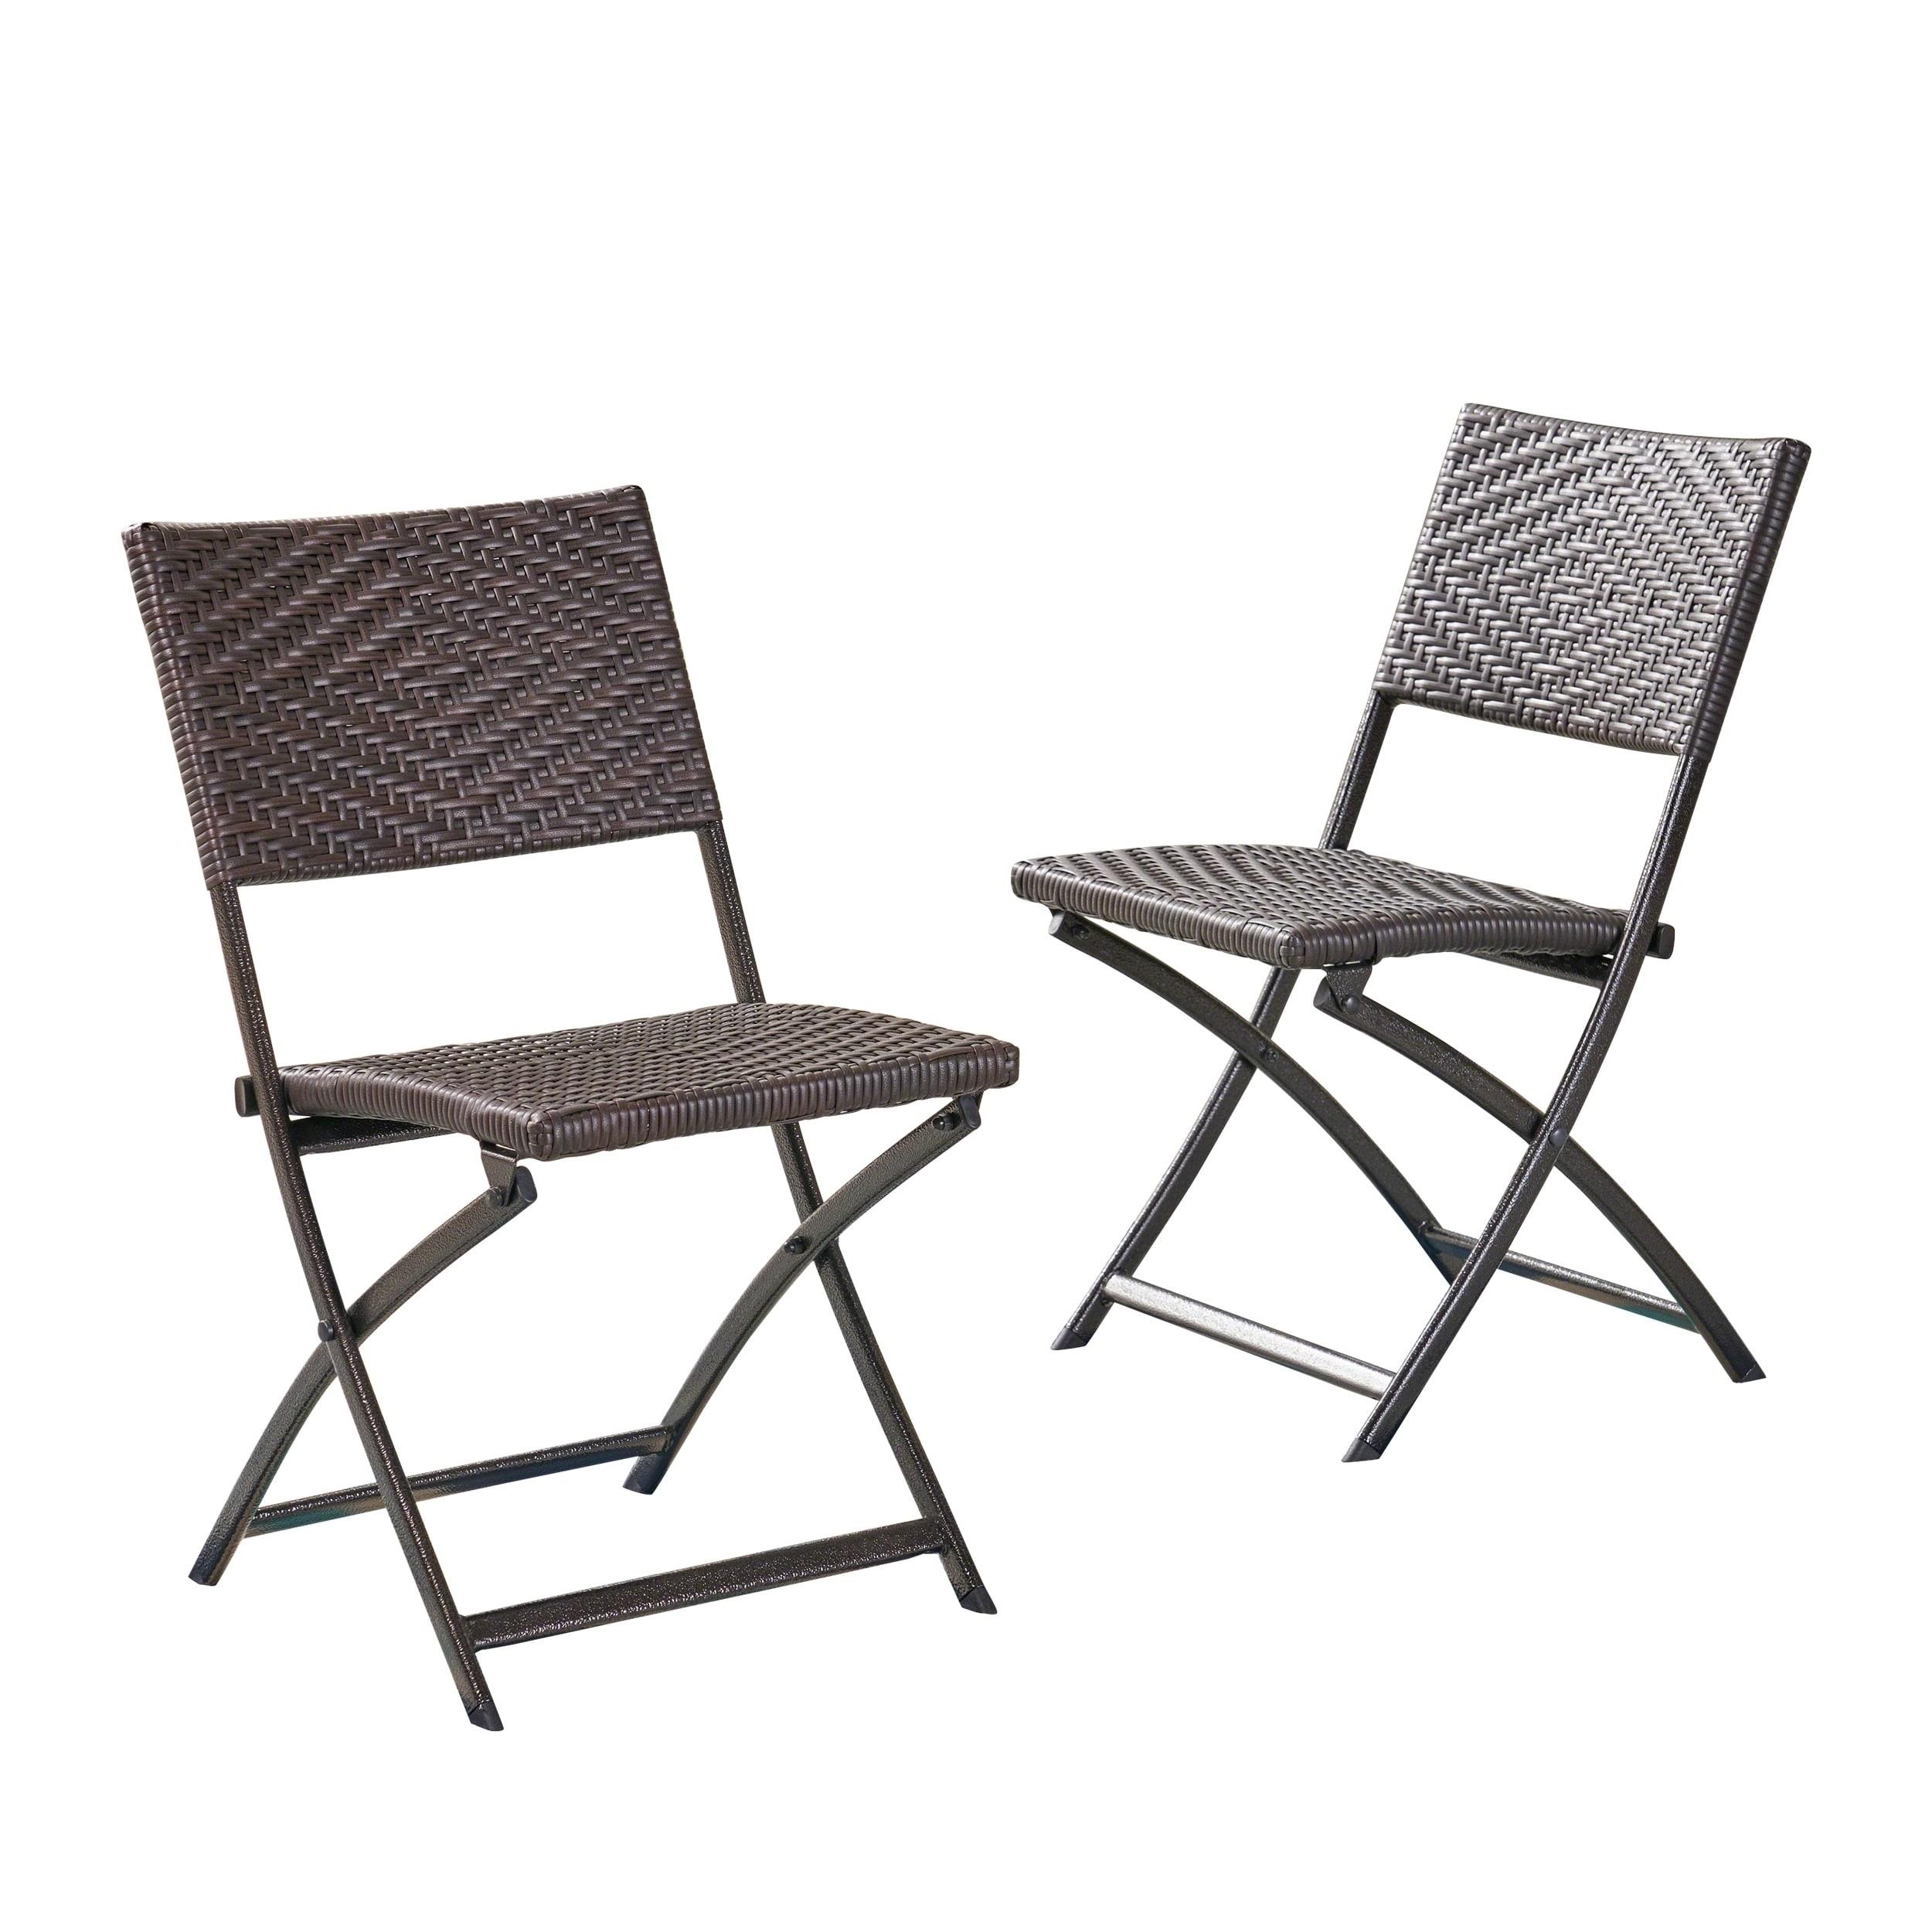 Fine Christopher Knight Home El Paso Outdoor Brown Wicker Folding Chair Set Of 2 Frankydiablos Diy Chair Ideas Frankydiabloscom